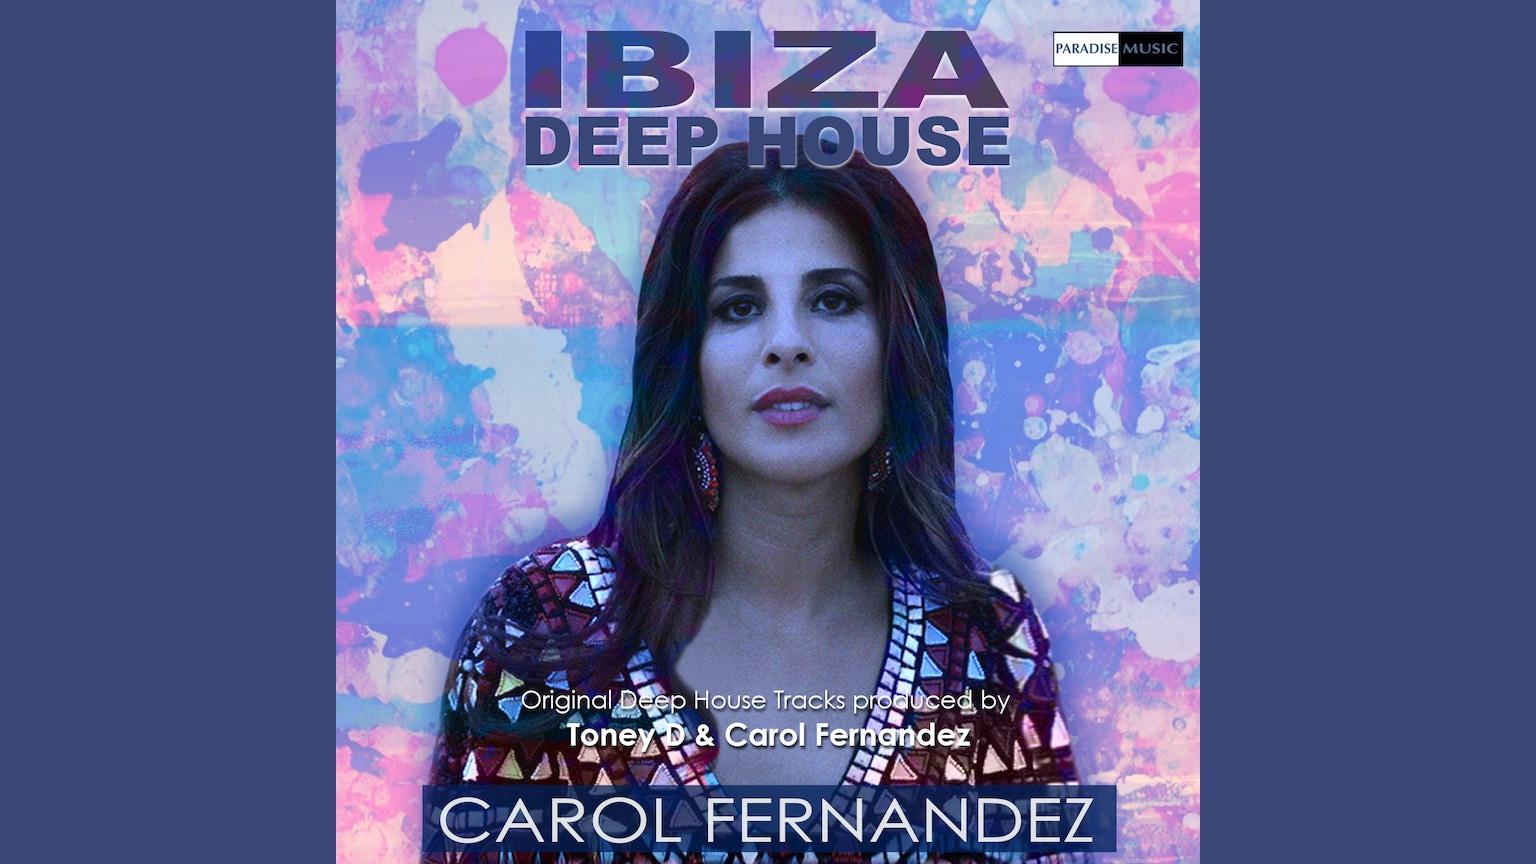 Carol fernandez first album by carol fernandez kickstarter for Deep house singles